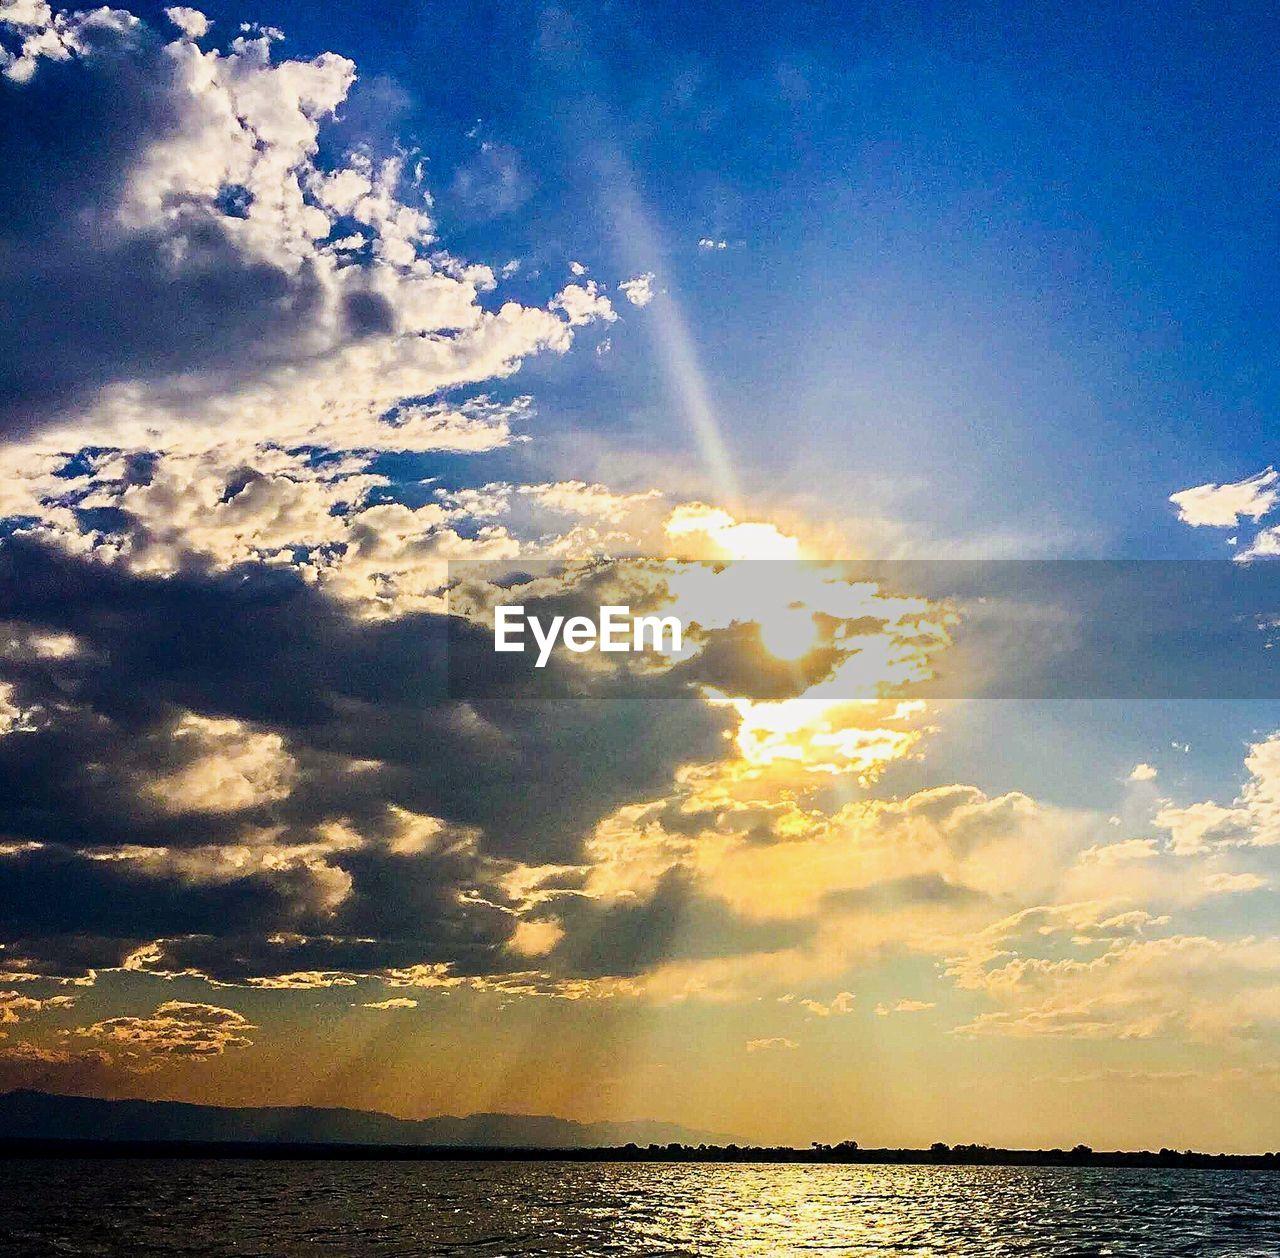 sky, cloud - sky, beauty in nature, sea, water, tranquility, sunlight, scenics - nature, tranquil scene, sunbeam, nature, horizon, sunset, sun, no people, idyllic, horizon over water, waterfront, lens flare, outdoors, bright